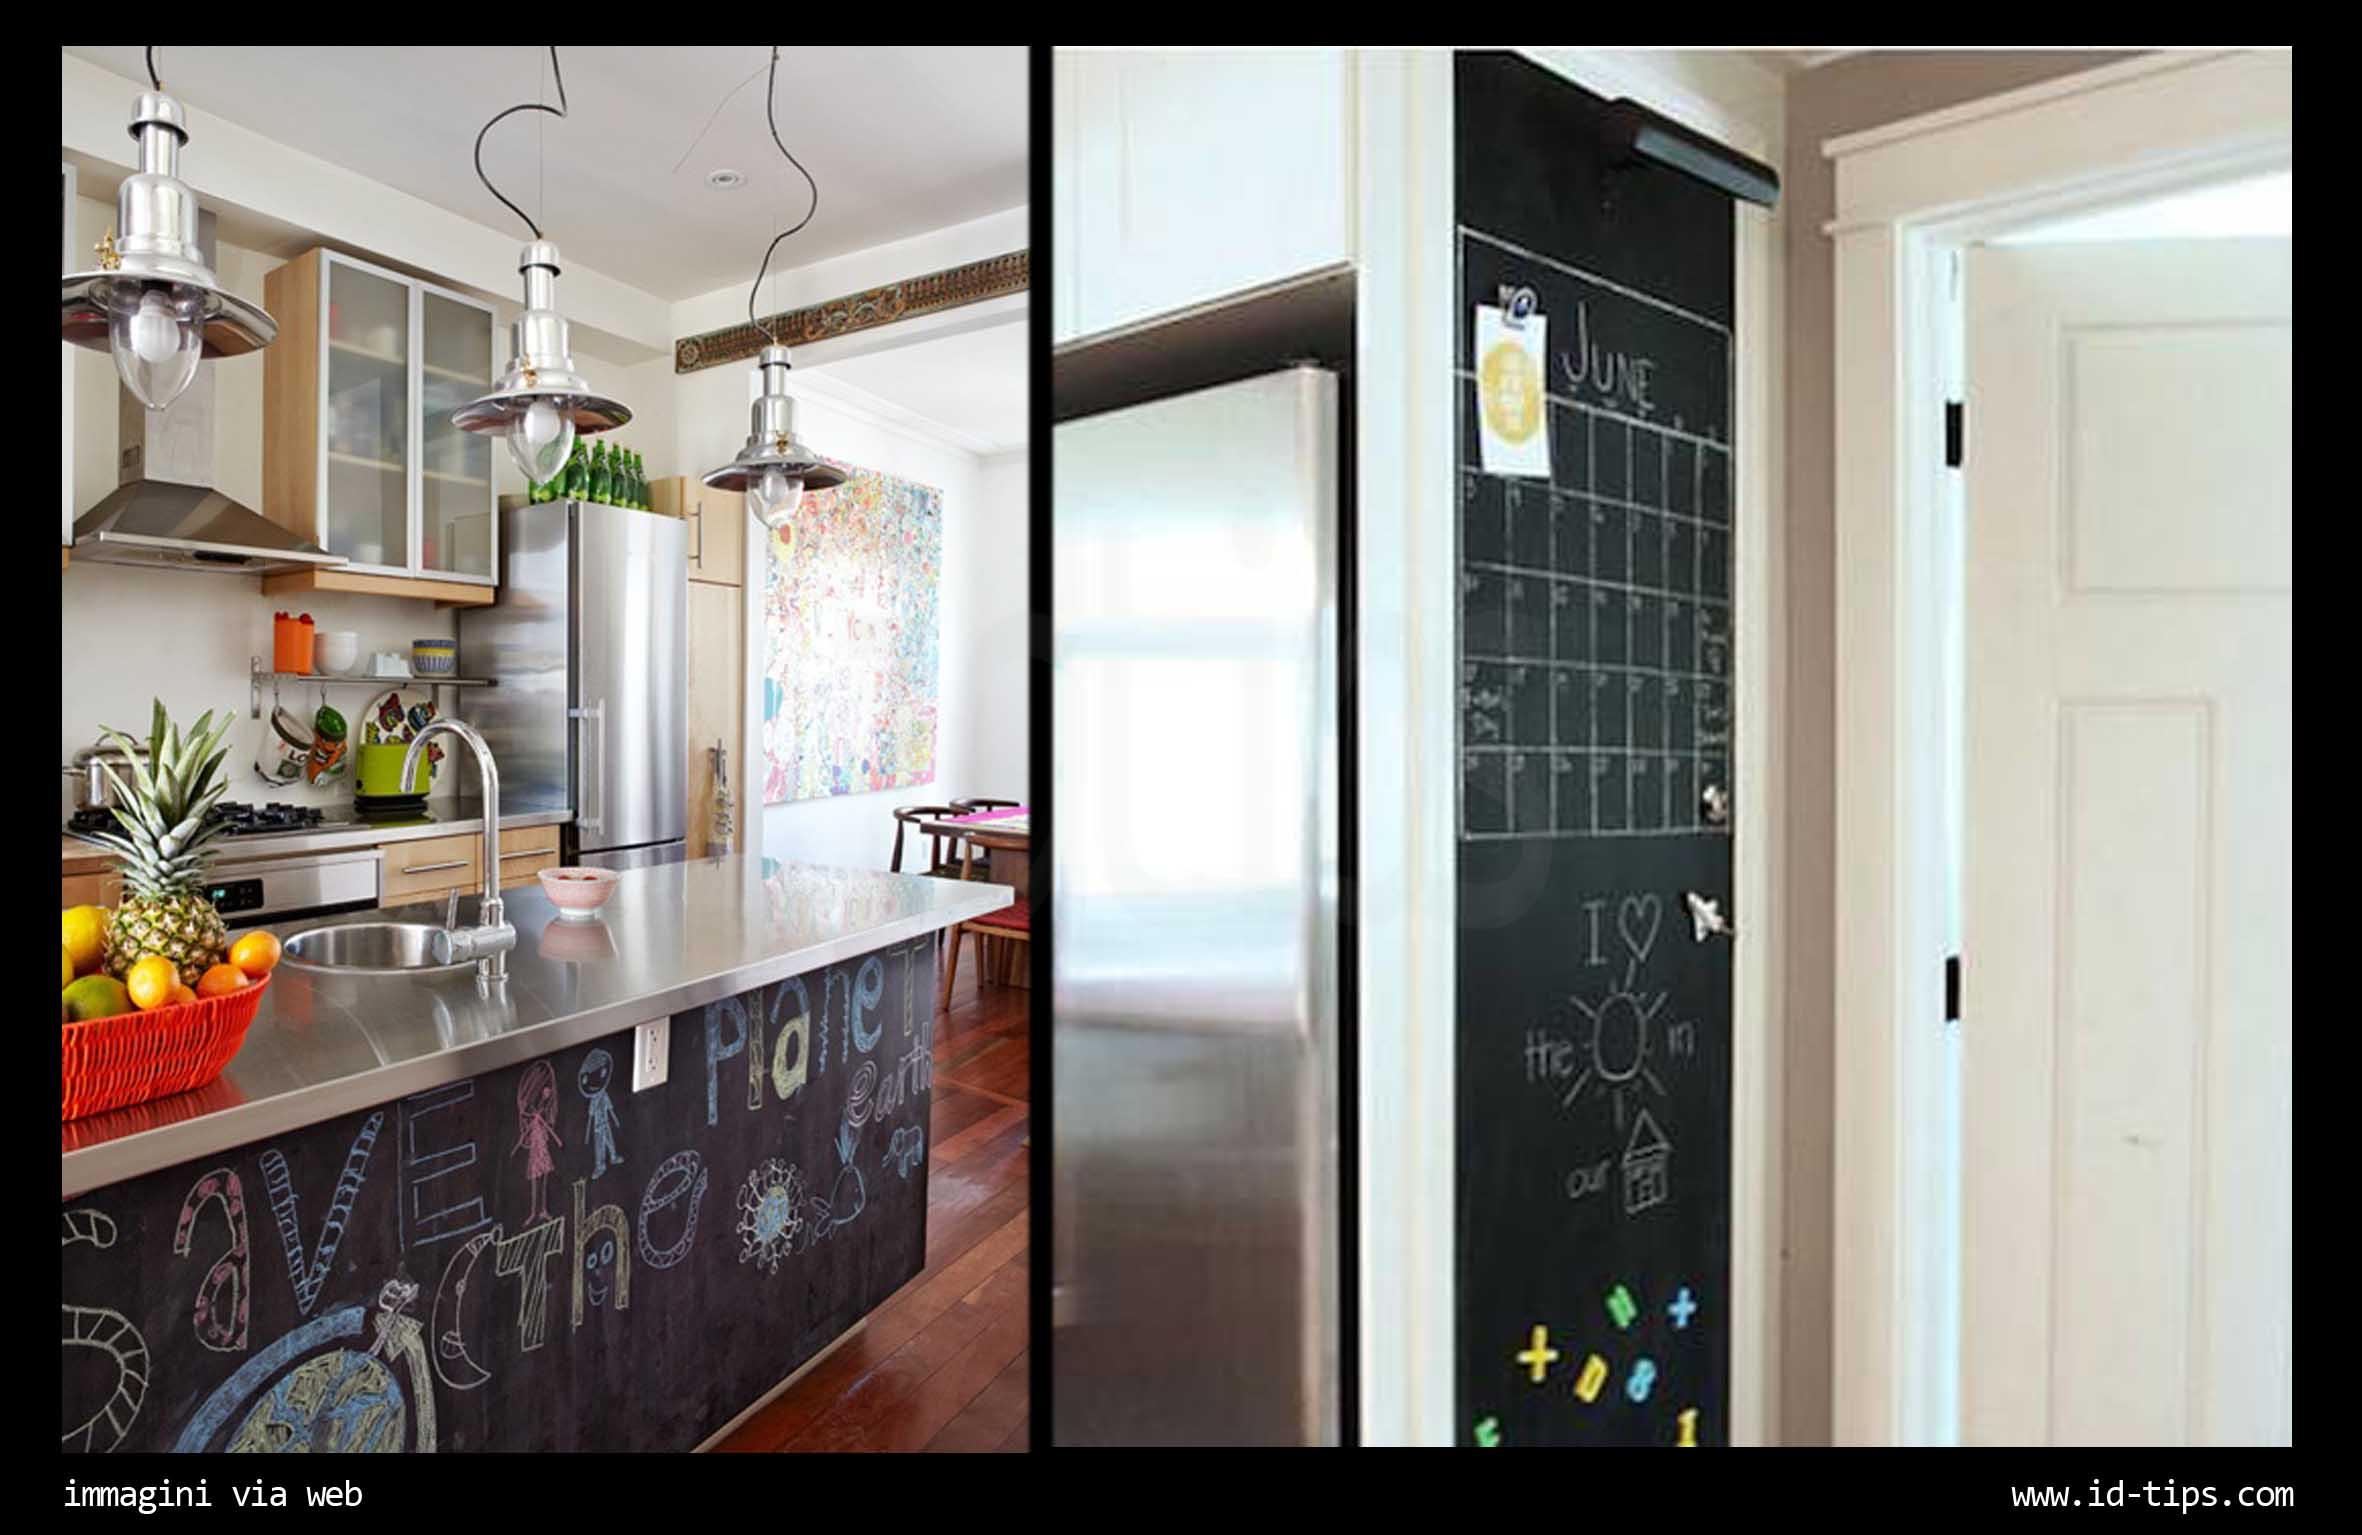 Una parete lavagna in casa - Parete lavagna cucina ...